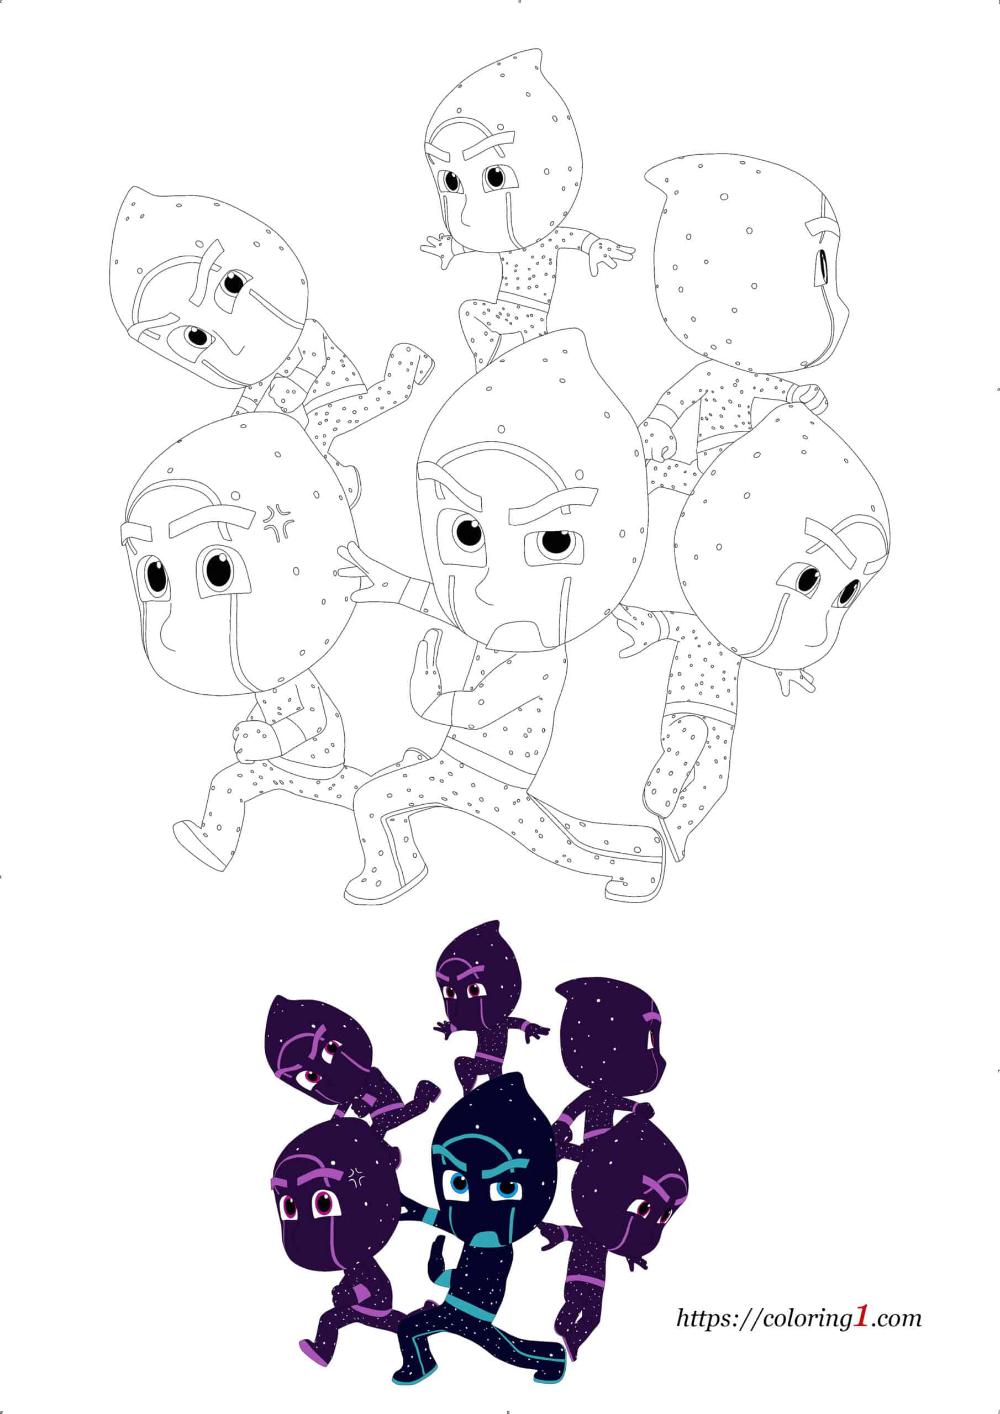 20+ Pj masks night ninja coloring page free download